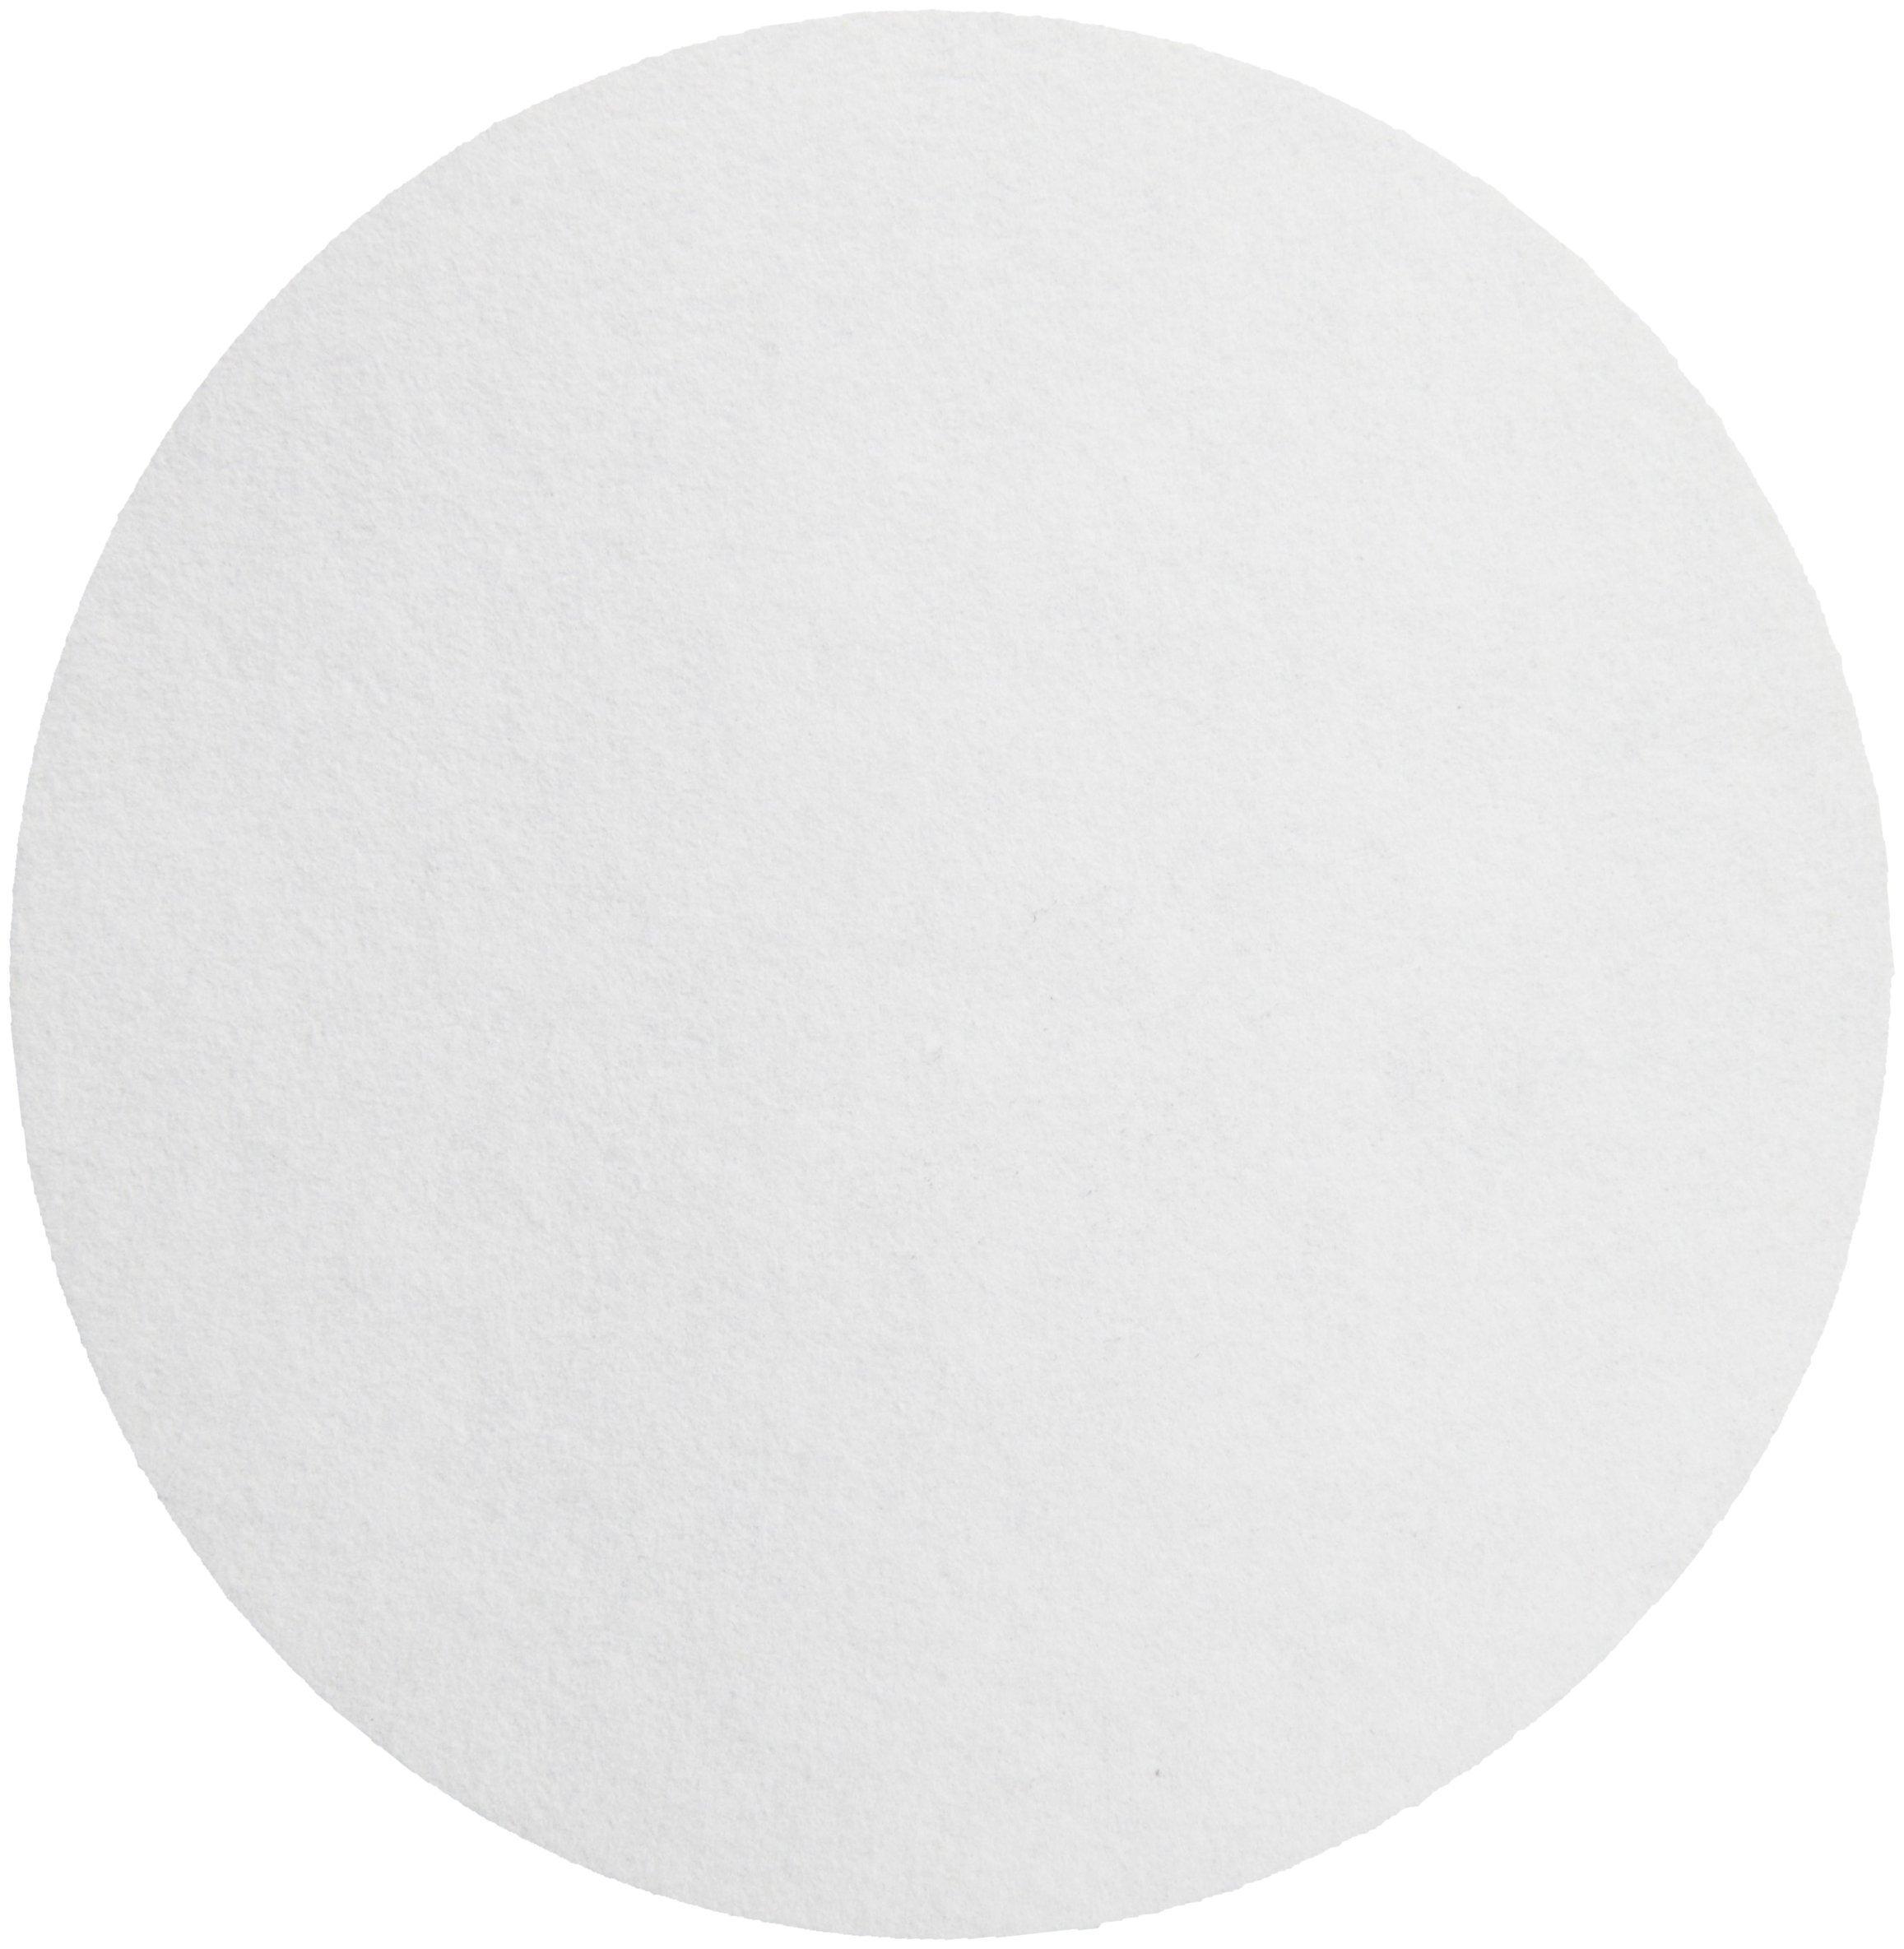 Whatman 1440-110 Quantitative Filter Paper Circles, 8 Micron, Grade 40, 110mm Diameter (Pack of 100) by Whatman